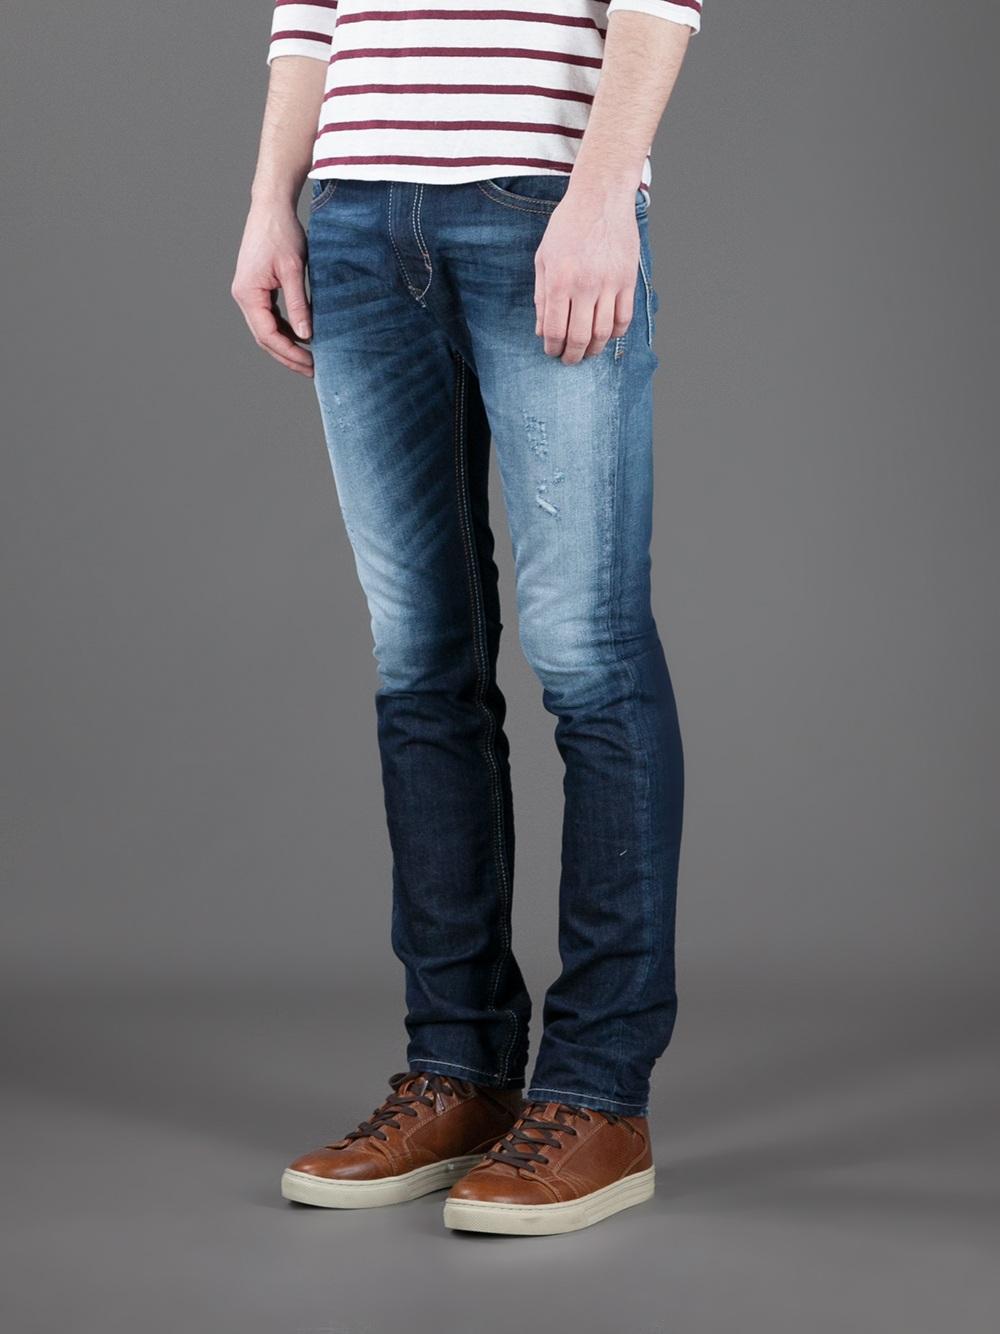 d2150469 DIESEL Thavar Slim Fit Jean in Blue for Men - Lyst